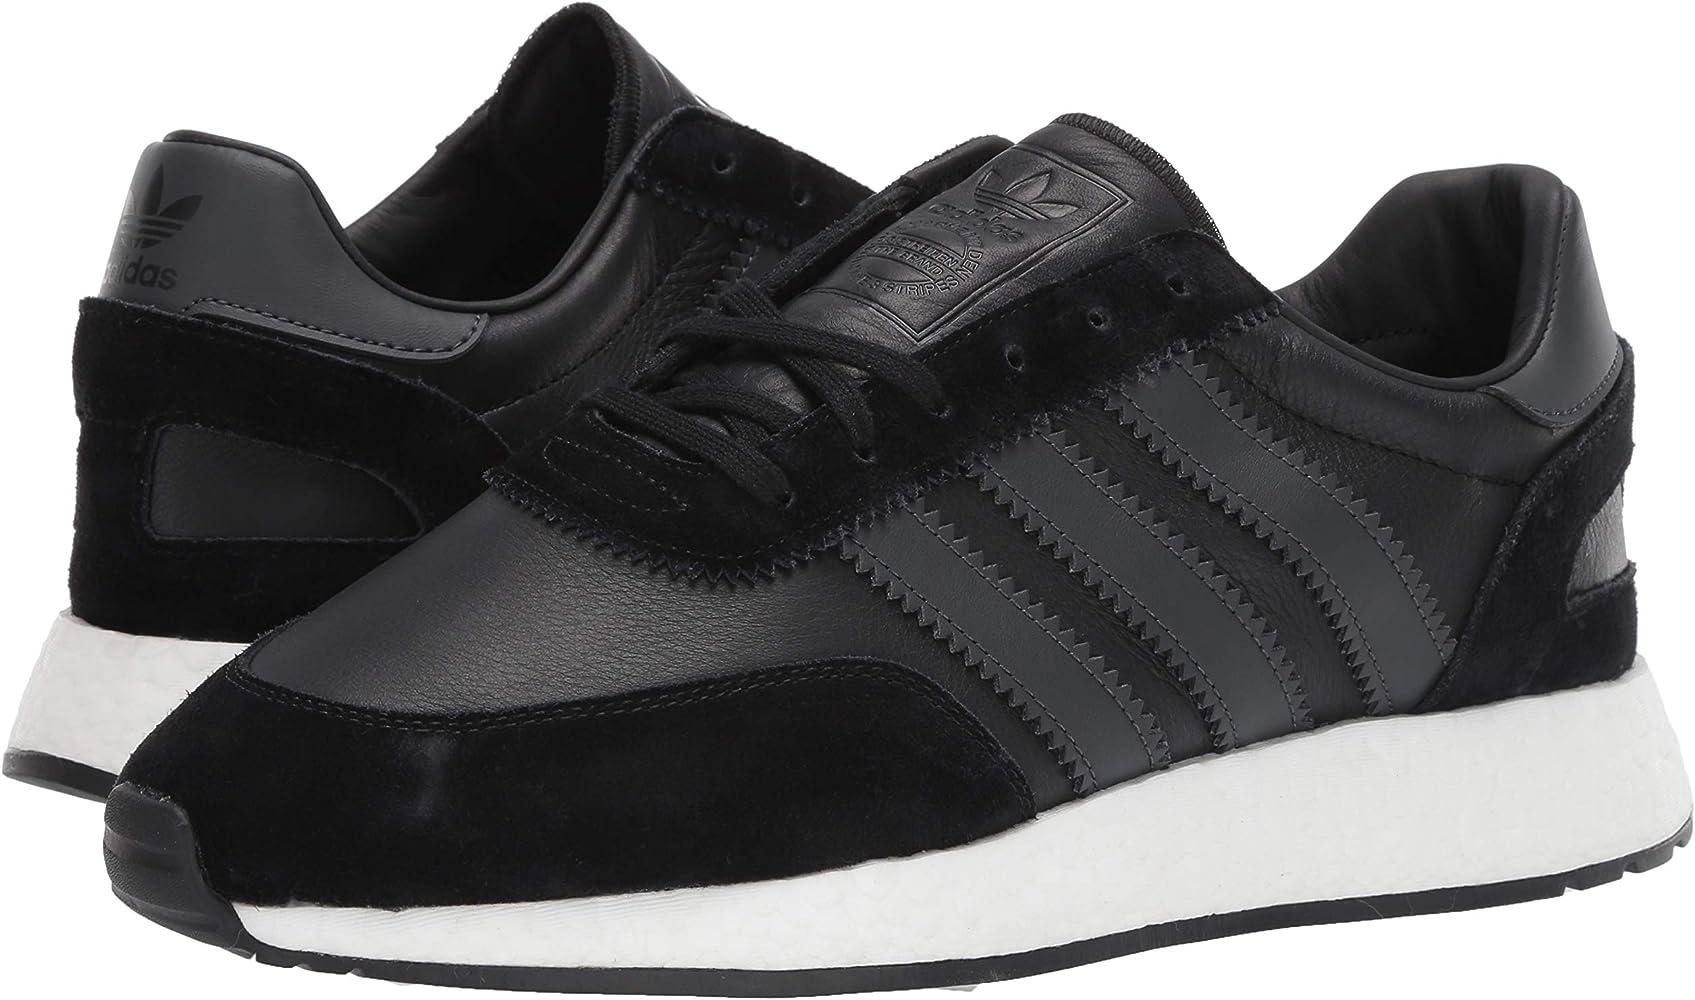 f0e4903307f0d Men's I-5923 Running Shoe, Black/Carbon/White, 12.5 M US